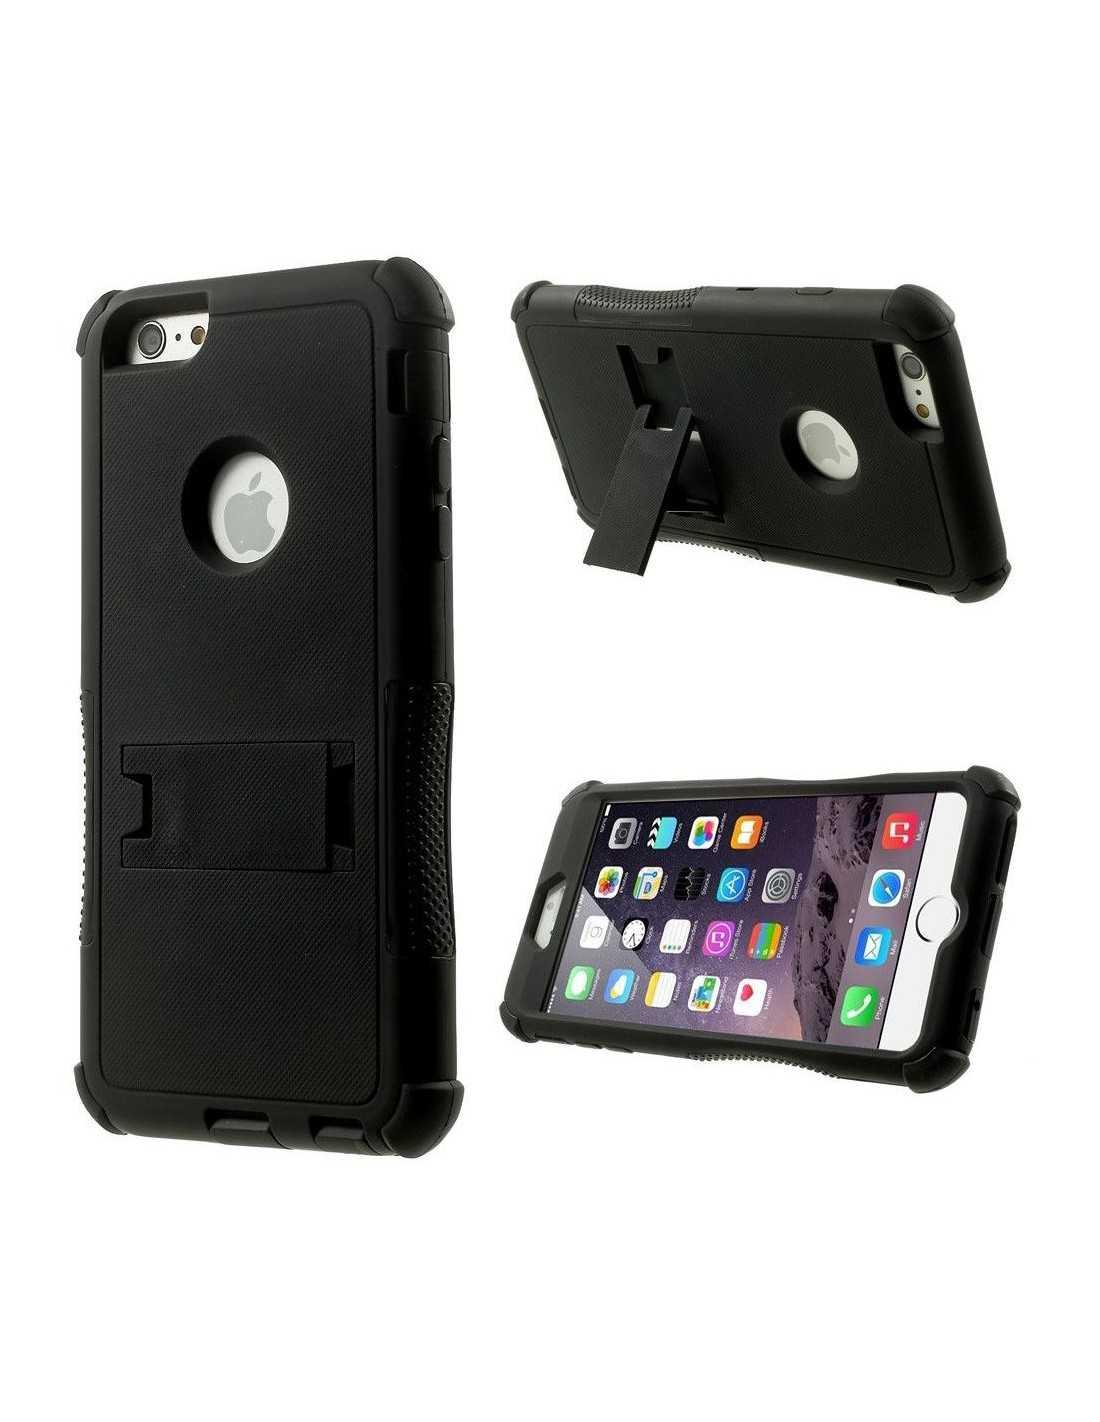 coque iphone 6 plus et 6s plus ultra protection